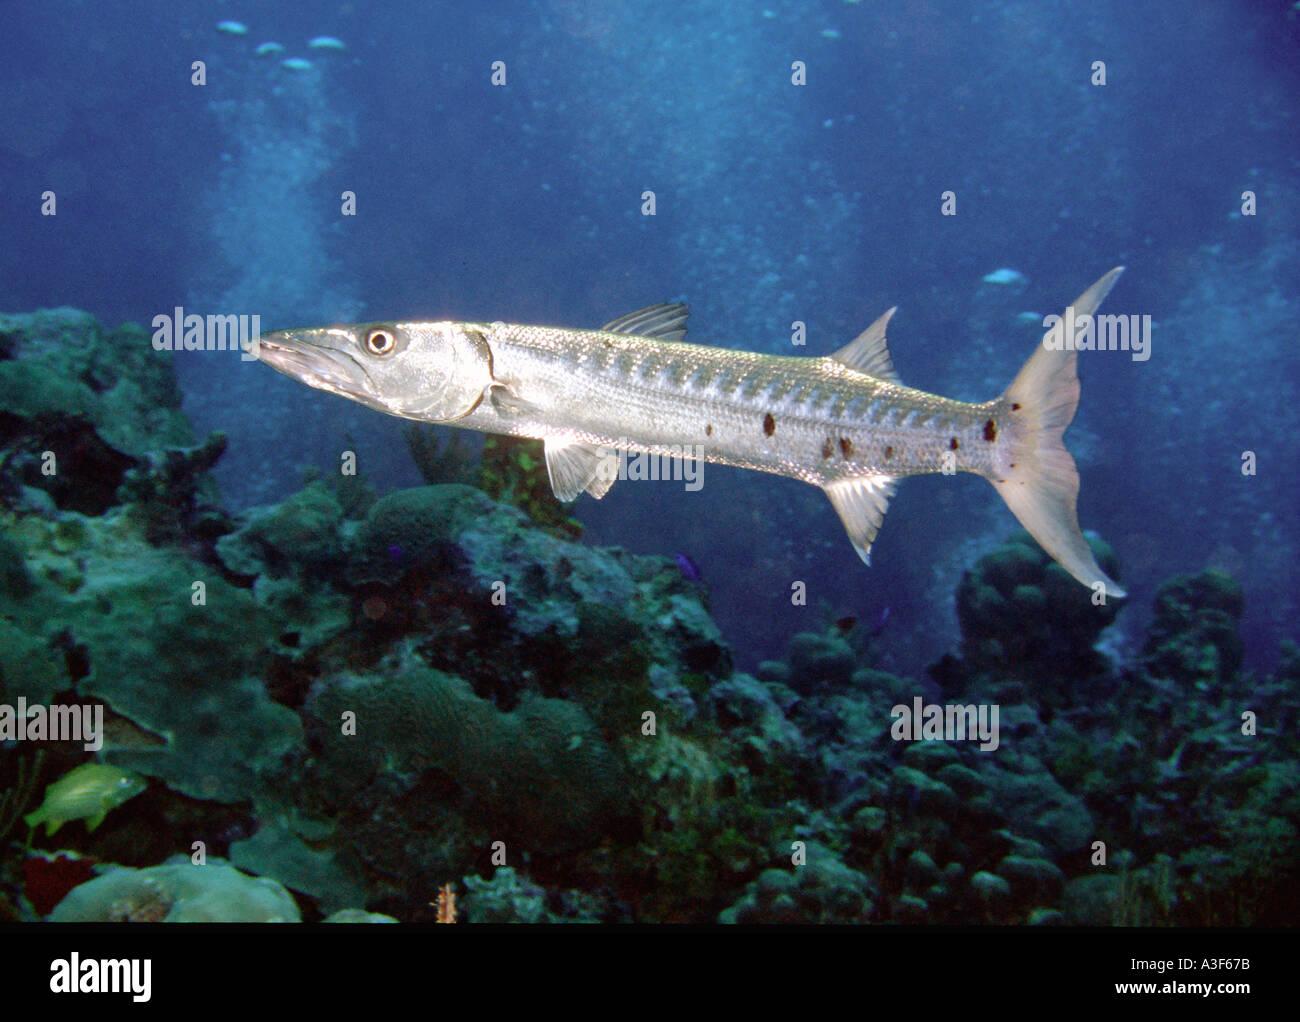 underwater, Barracuda, cayman islands Stock Photo